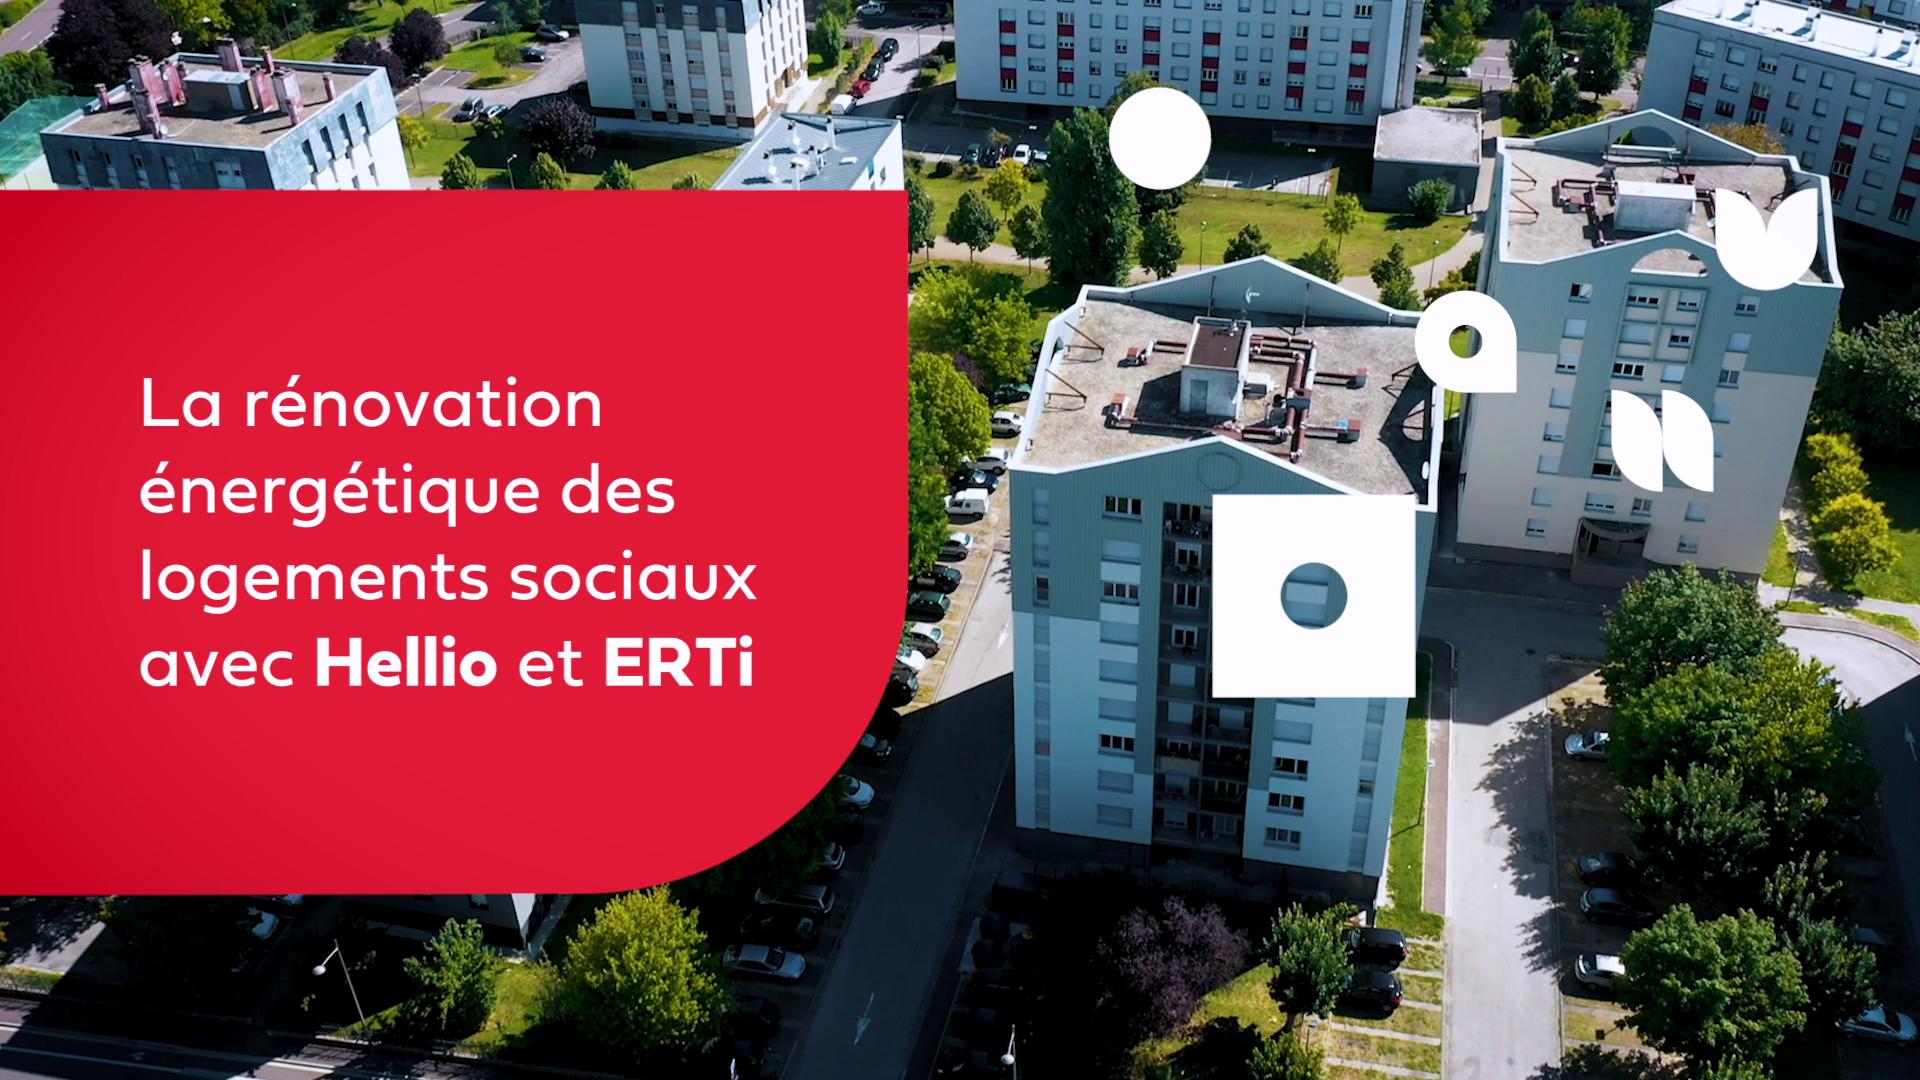 Hellio_ERTi_Troyes